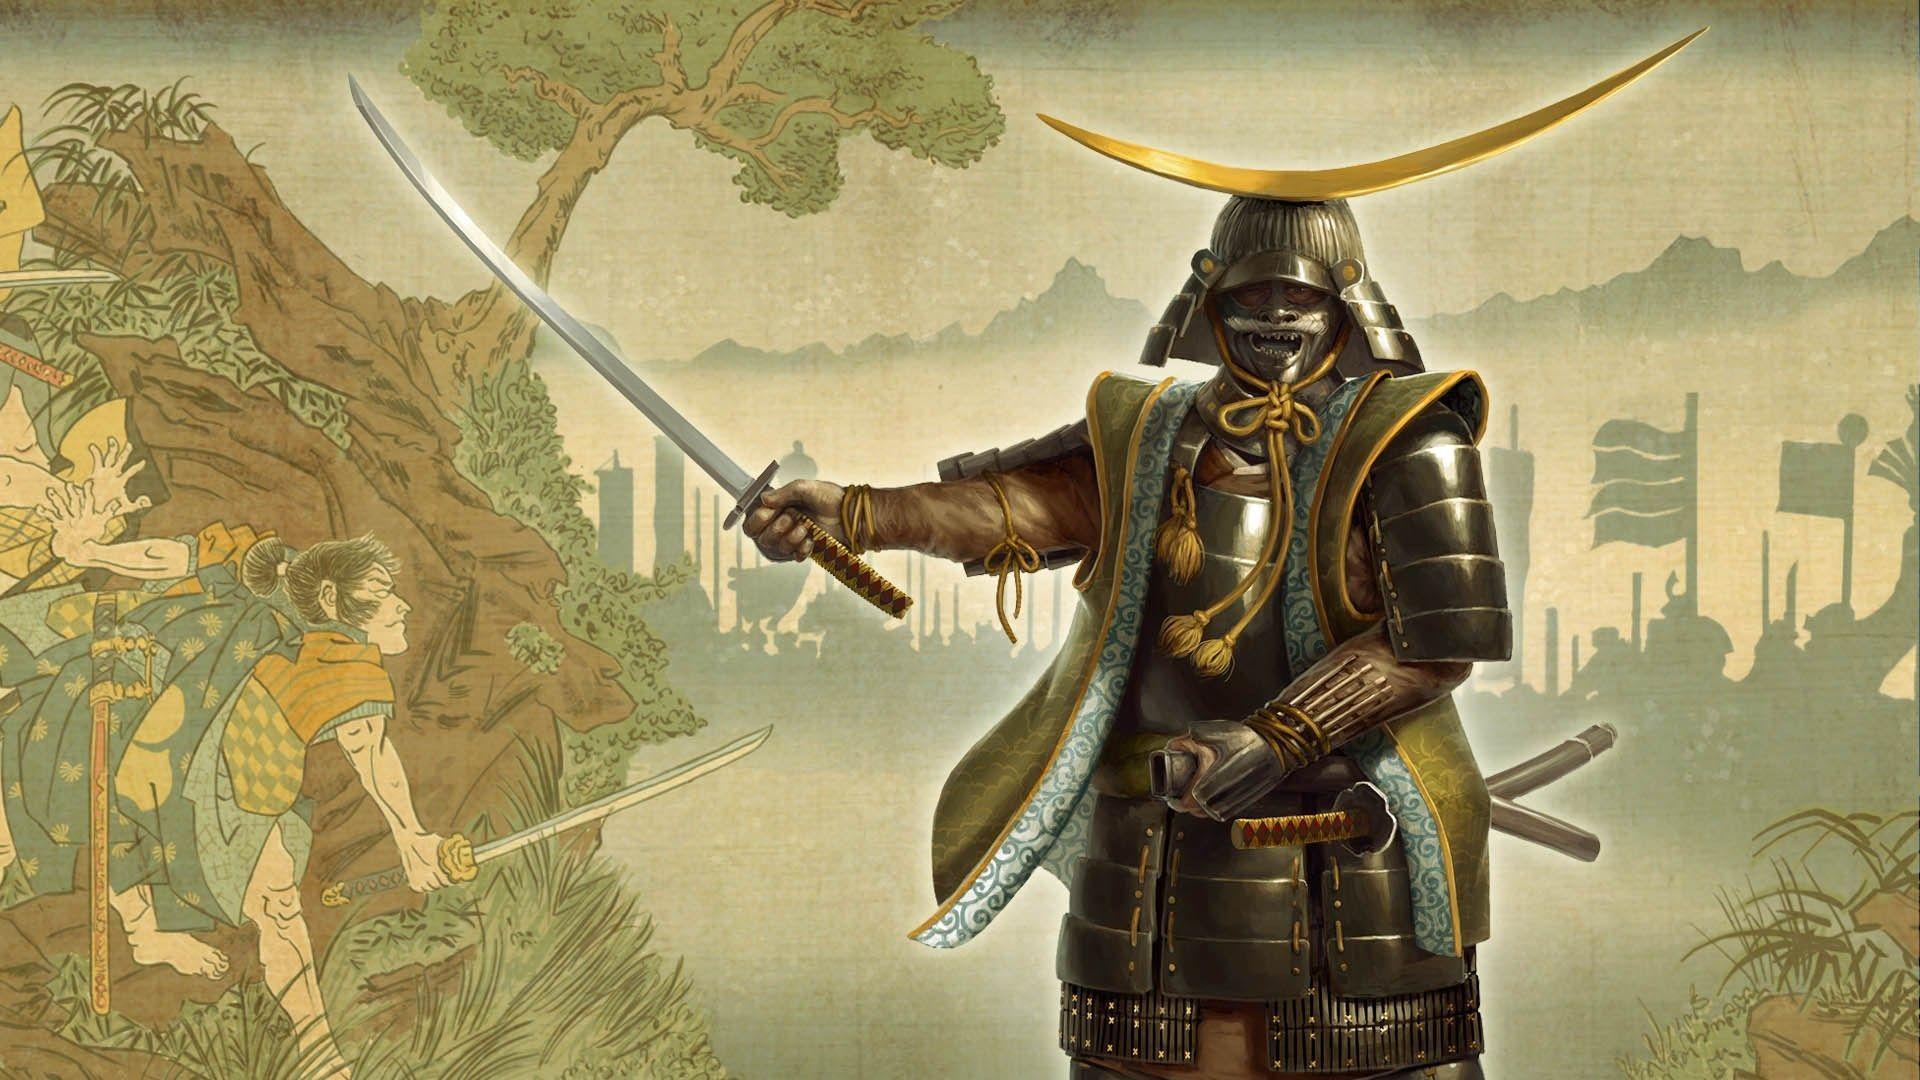 60 best free ninja shogun 2 total war wallpapers - wallpaperaccess